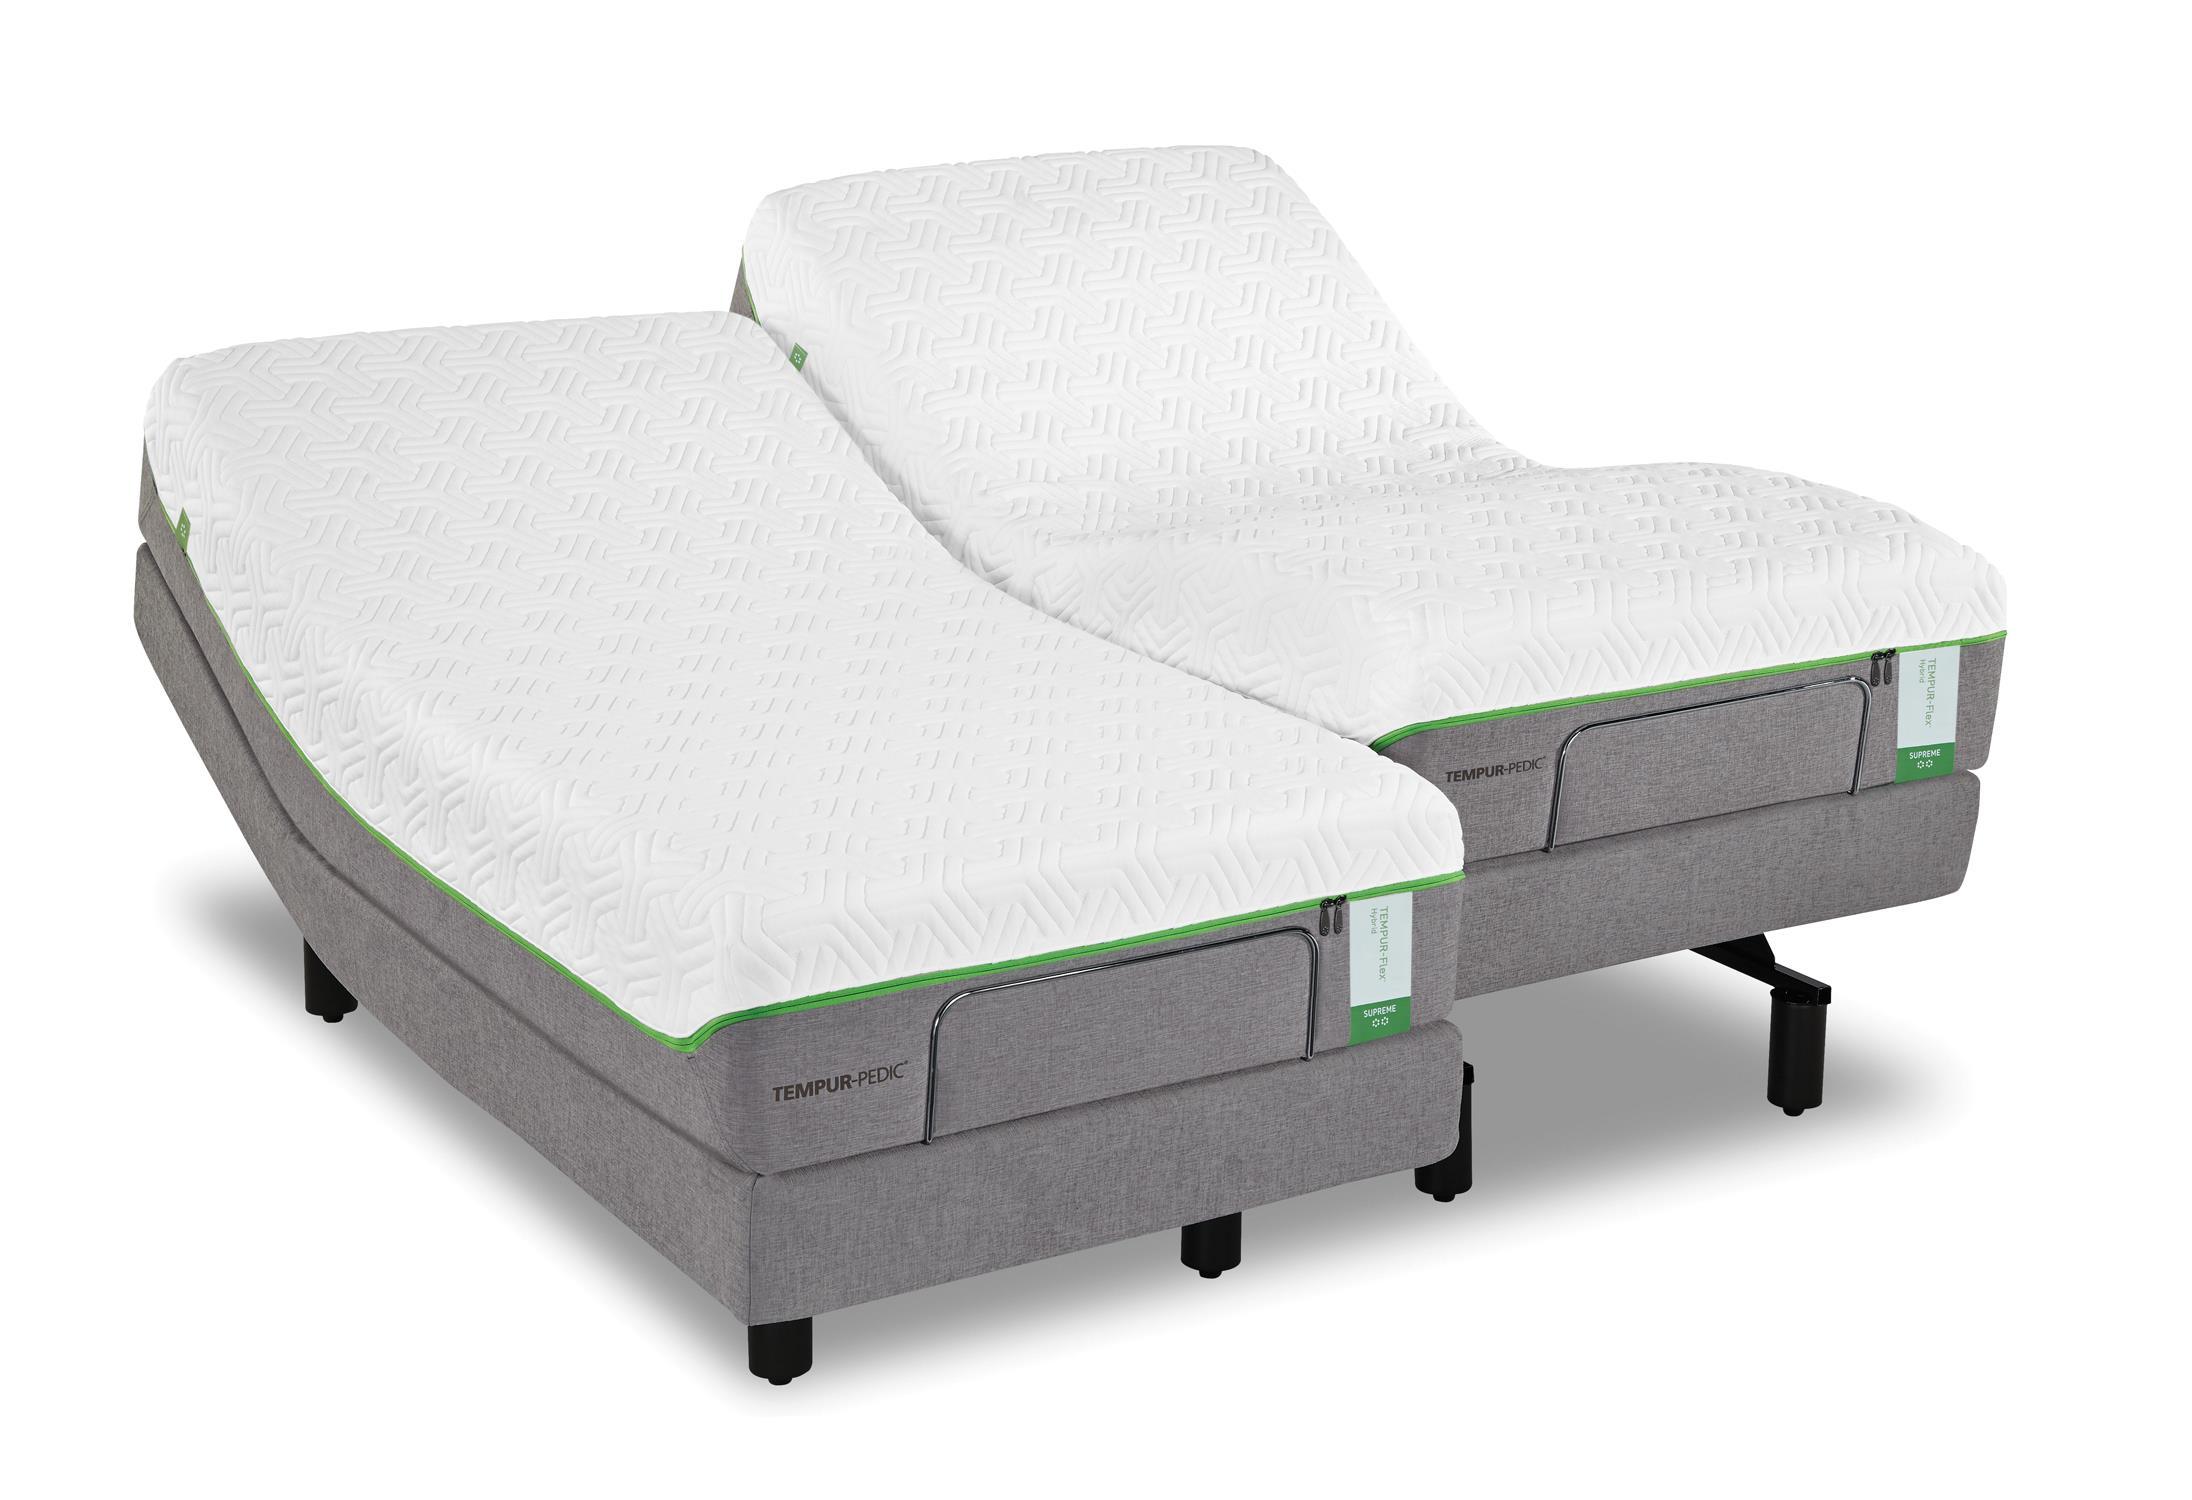 Tempur-Pedic® TEMPUR-Flex Prima Twin Medium Firm Mattress Set - Item Number: 10115210+25289210